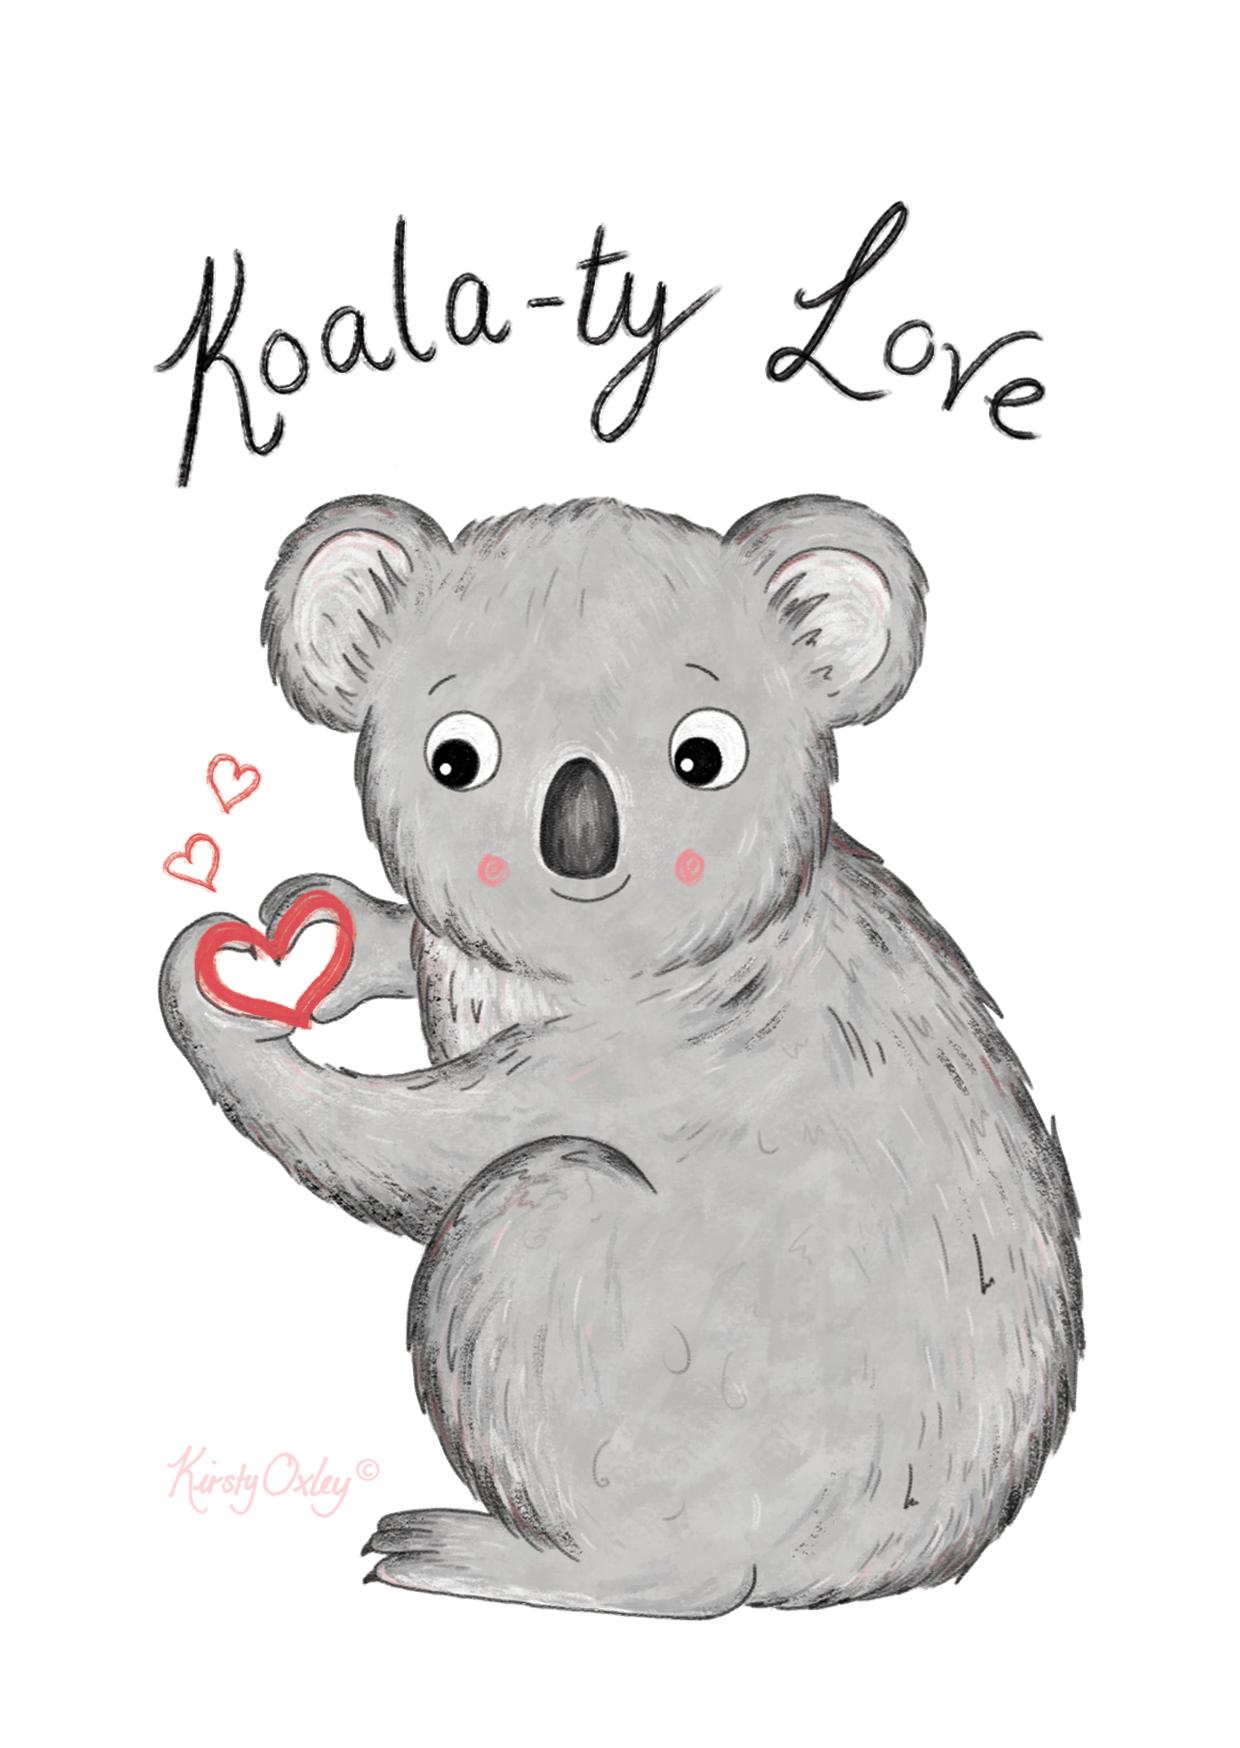 Koala_Valentines_Day_Love_Kirsty_Oxley_Illustration.jpg